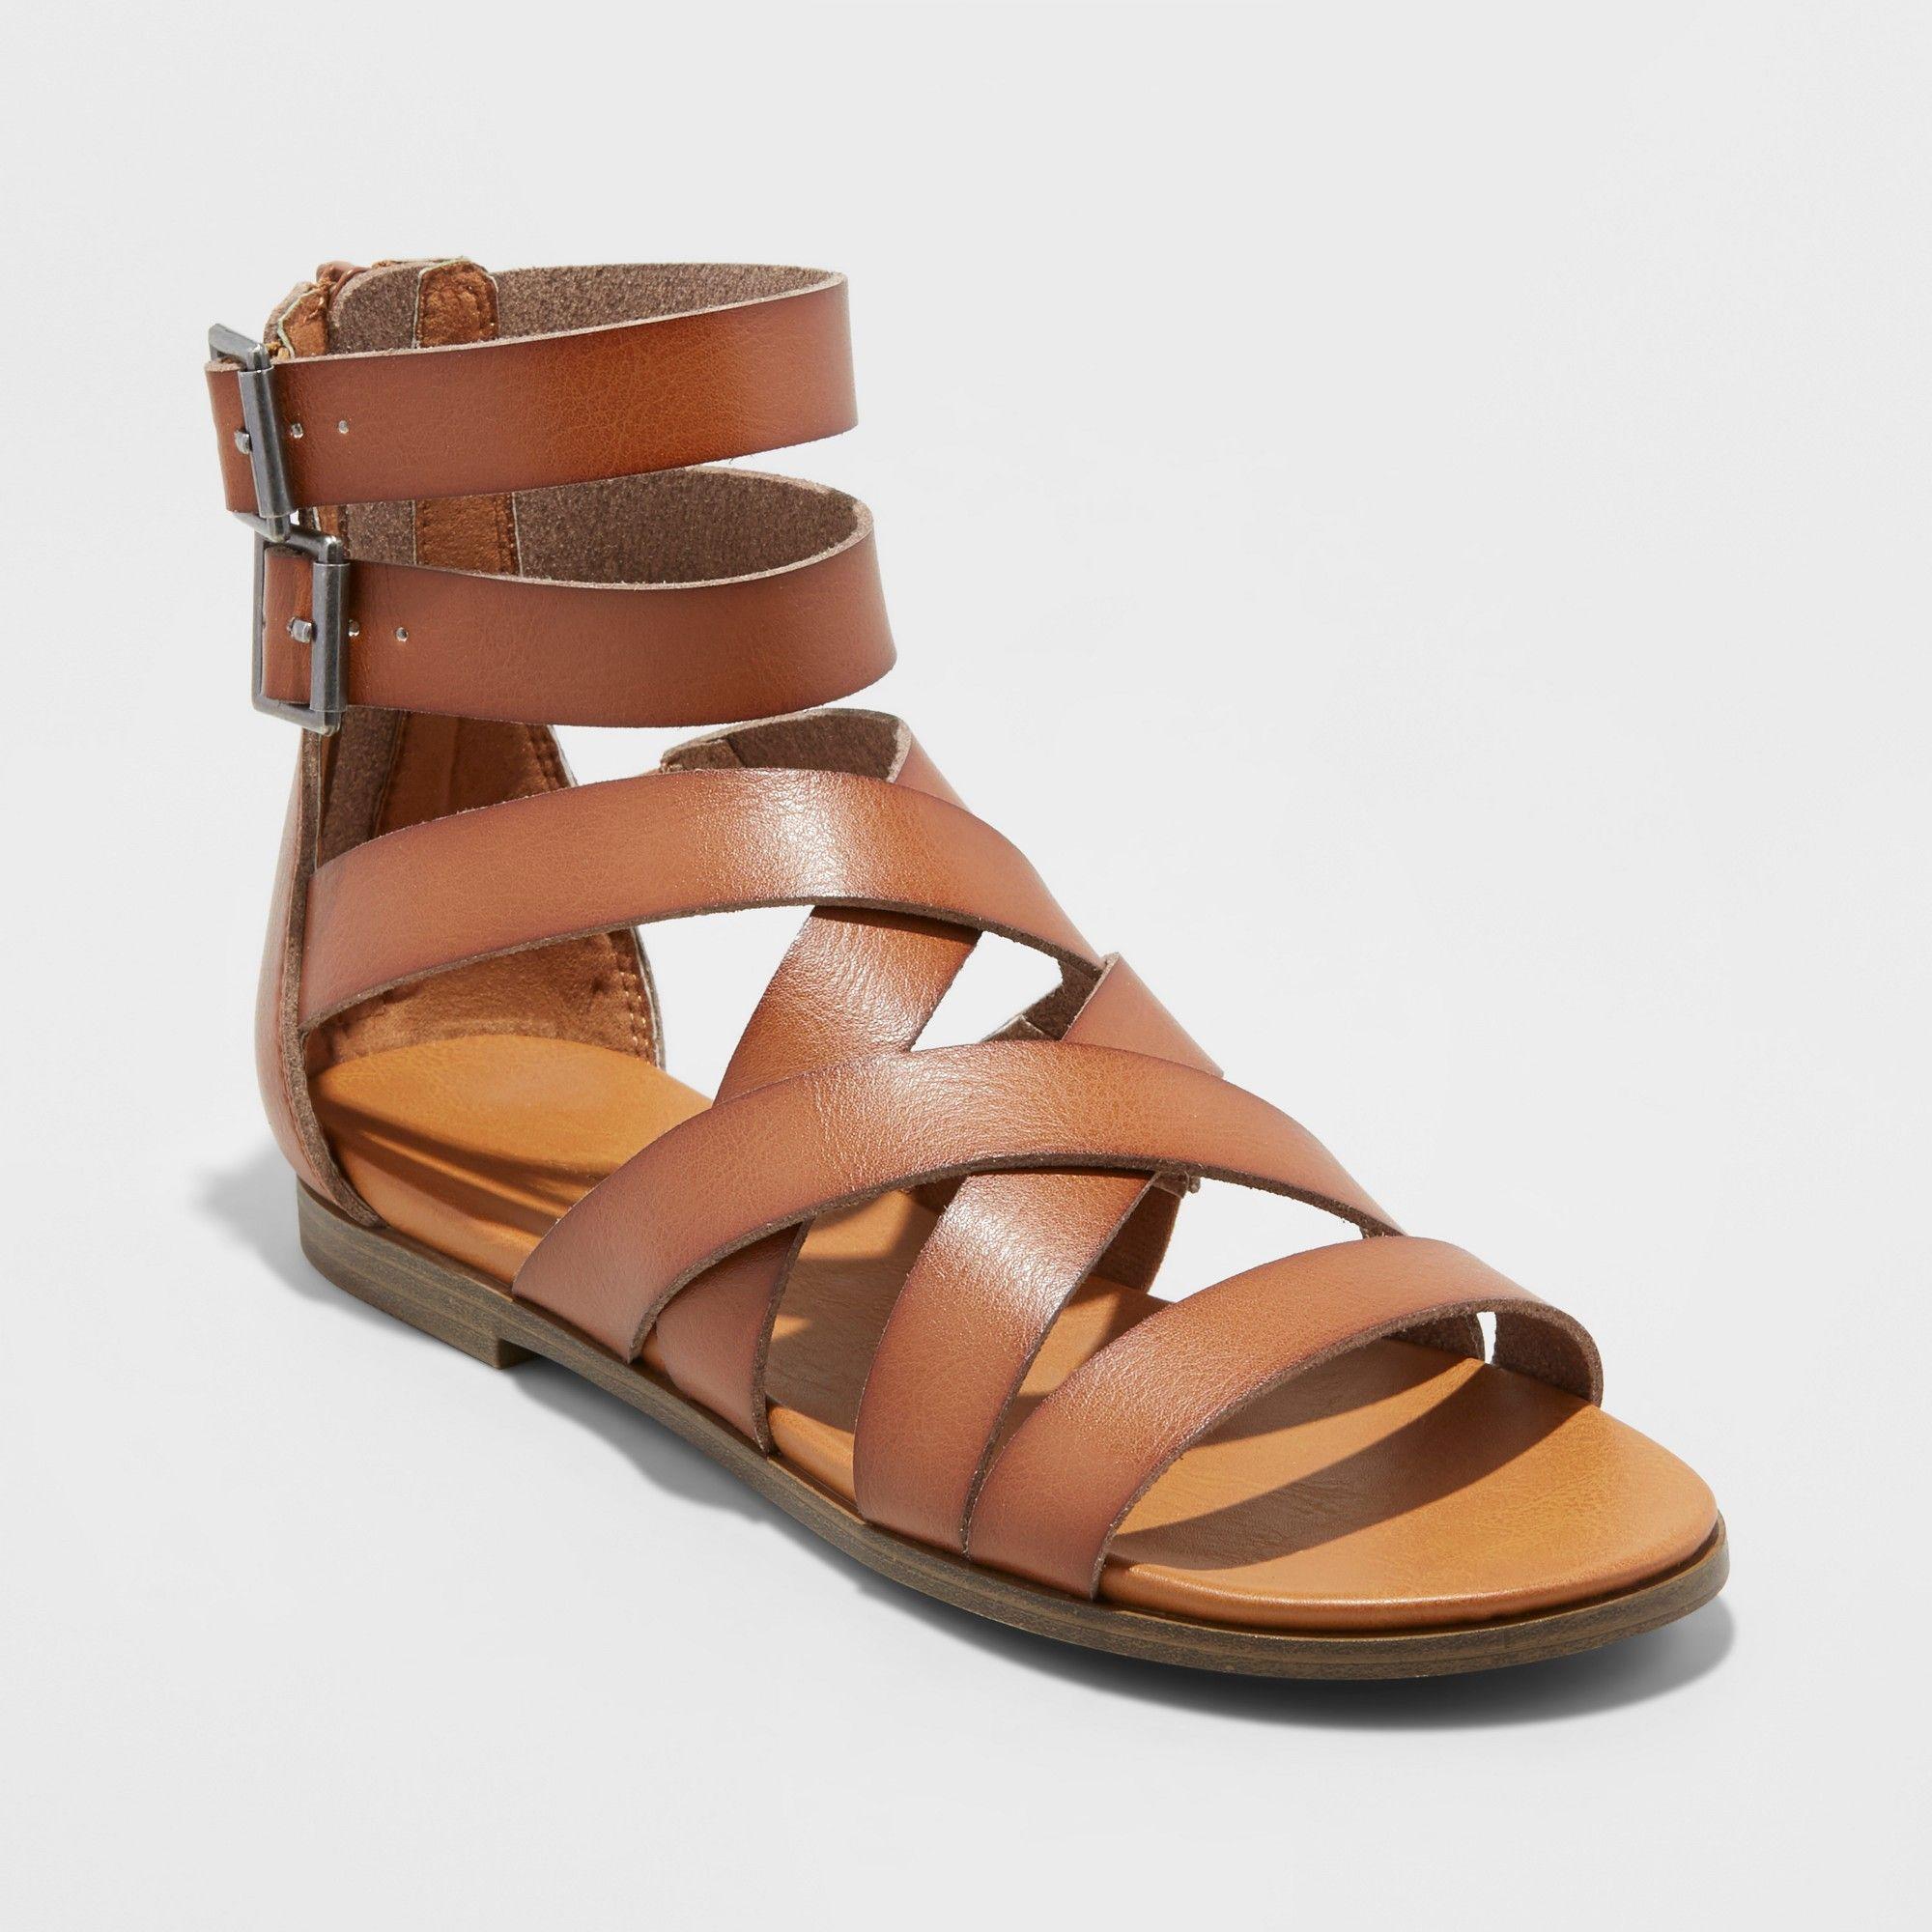 Gladiator sandals, Womens sandals